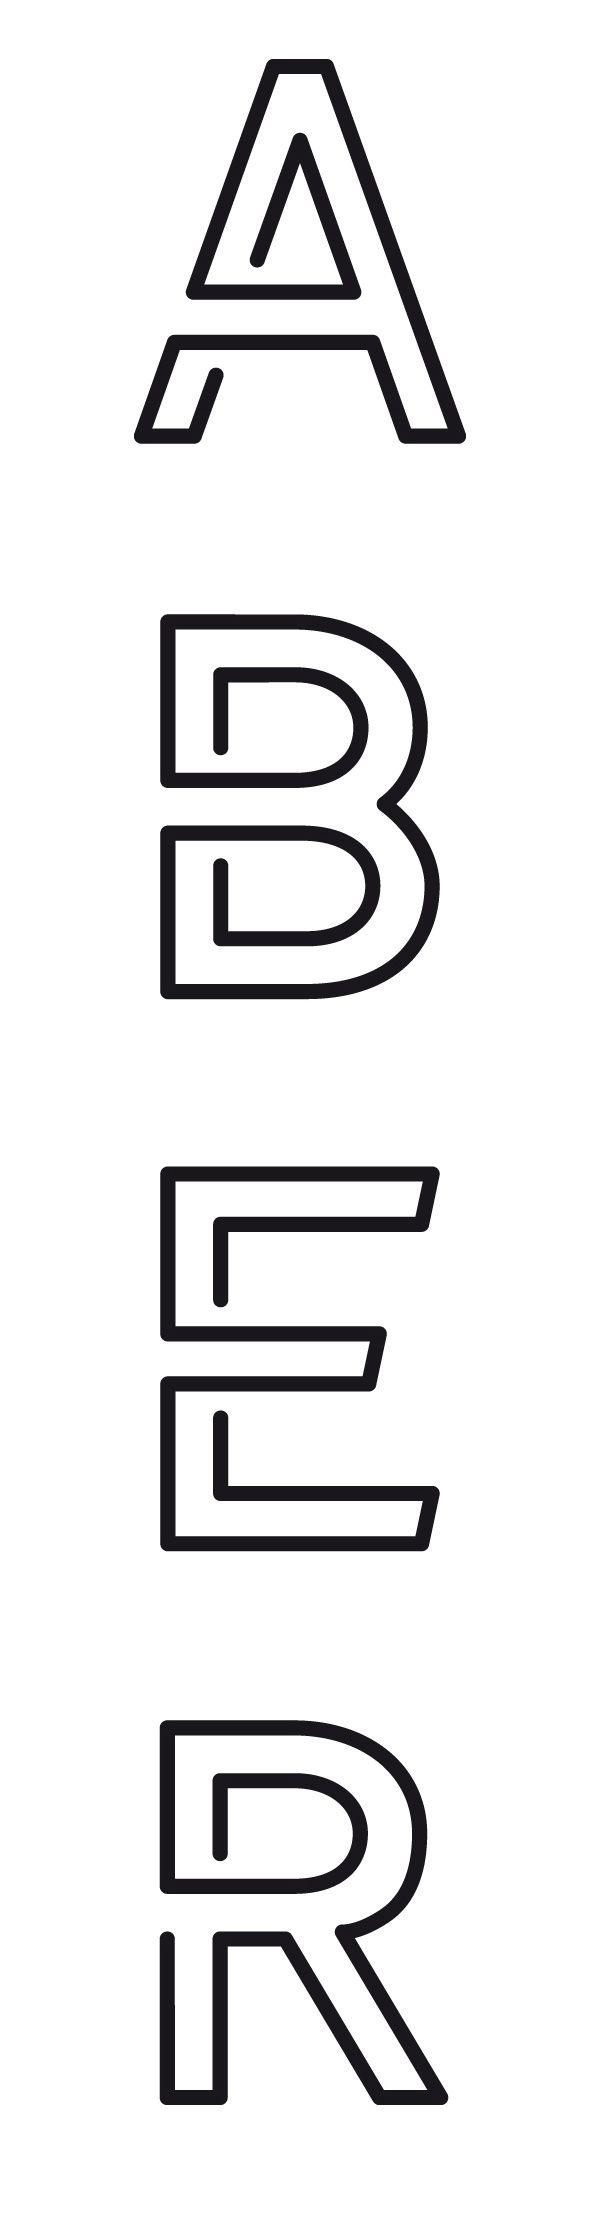 Erratum// Continuous line typeface. For the win.